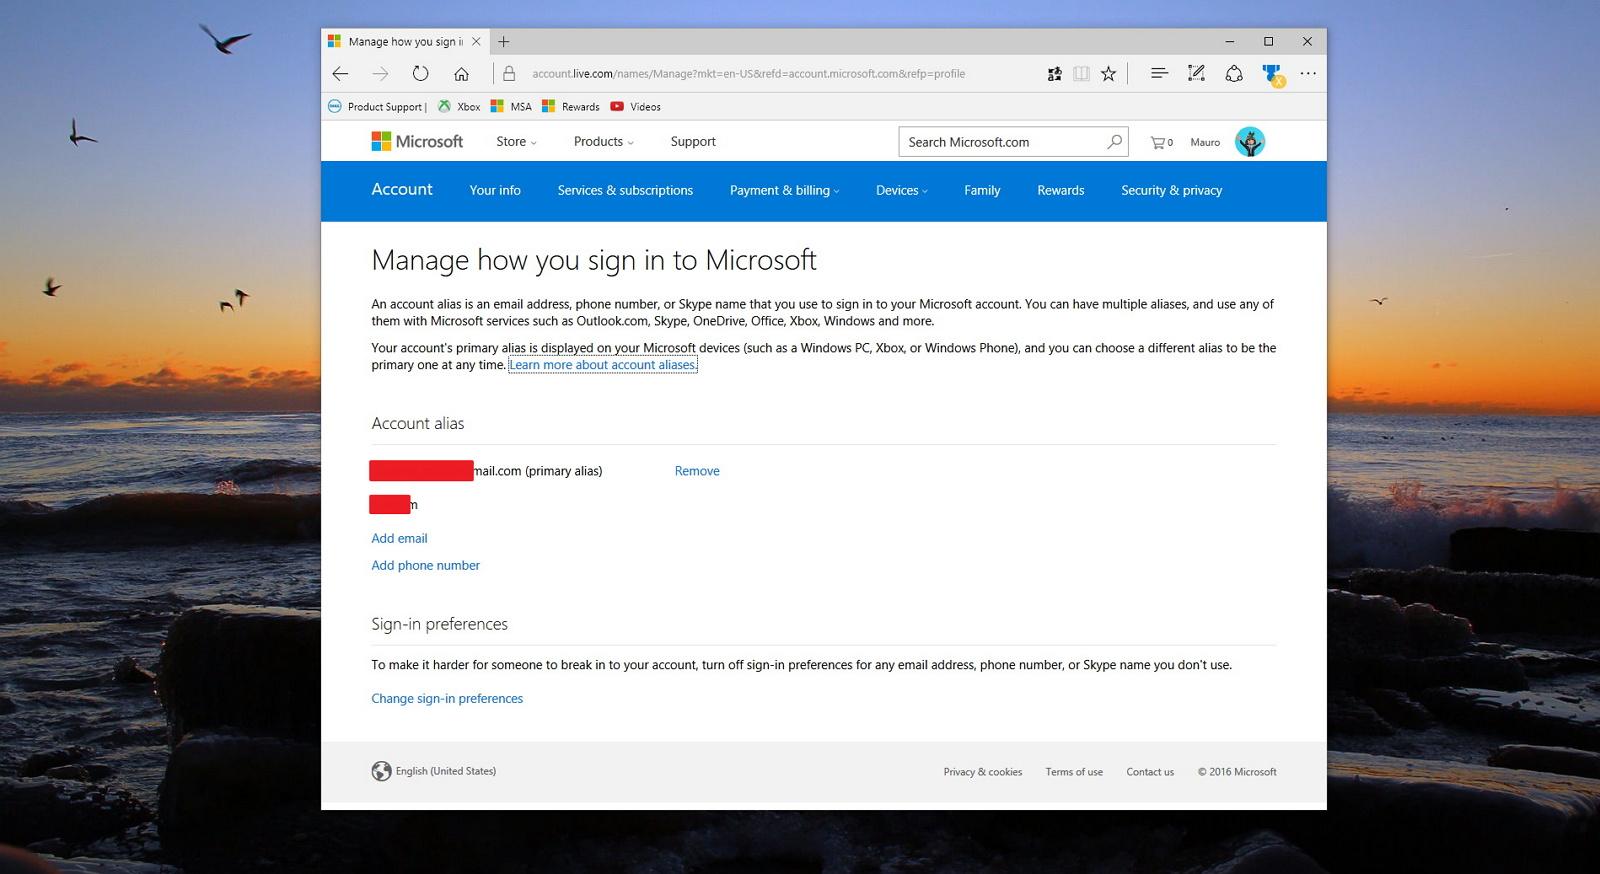 Microsoft account alias